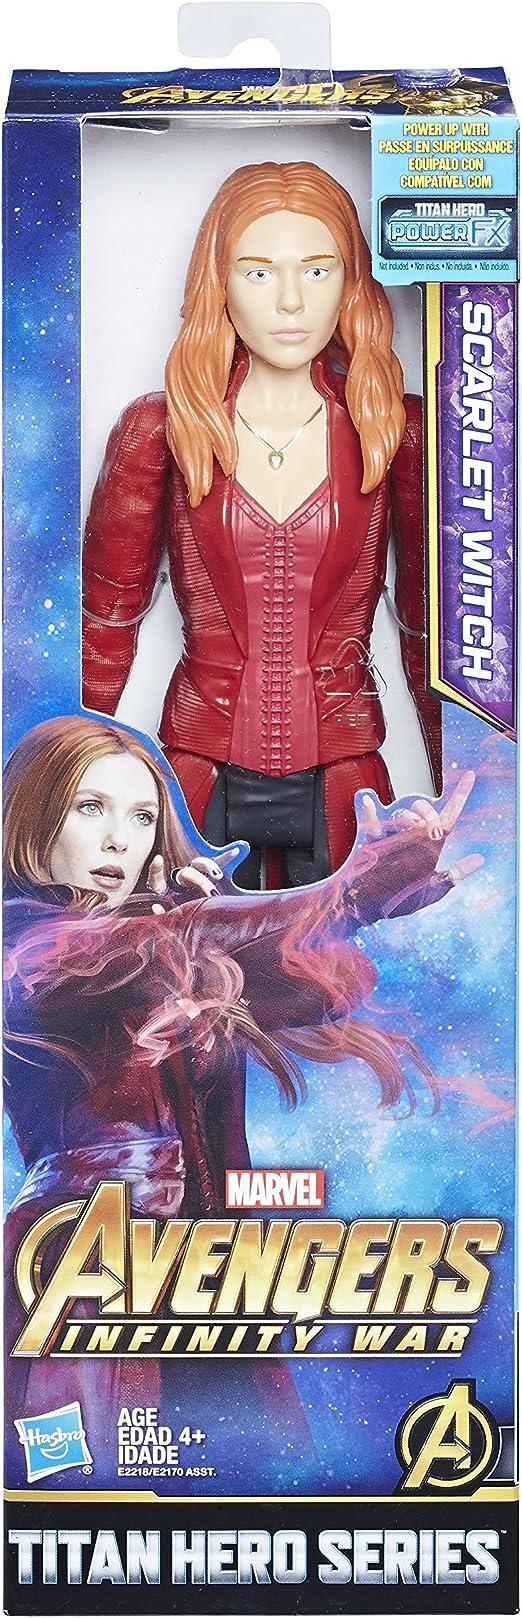 "Marvel Avengers Infinity War Scarlet Witch 12"" 2018 Titan Hero Series"